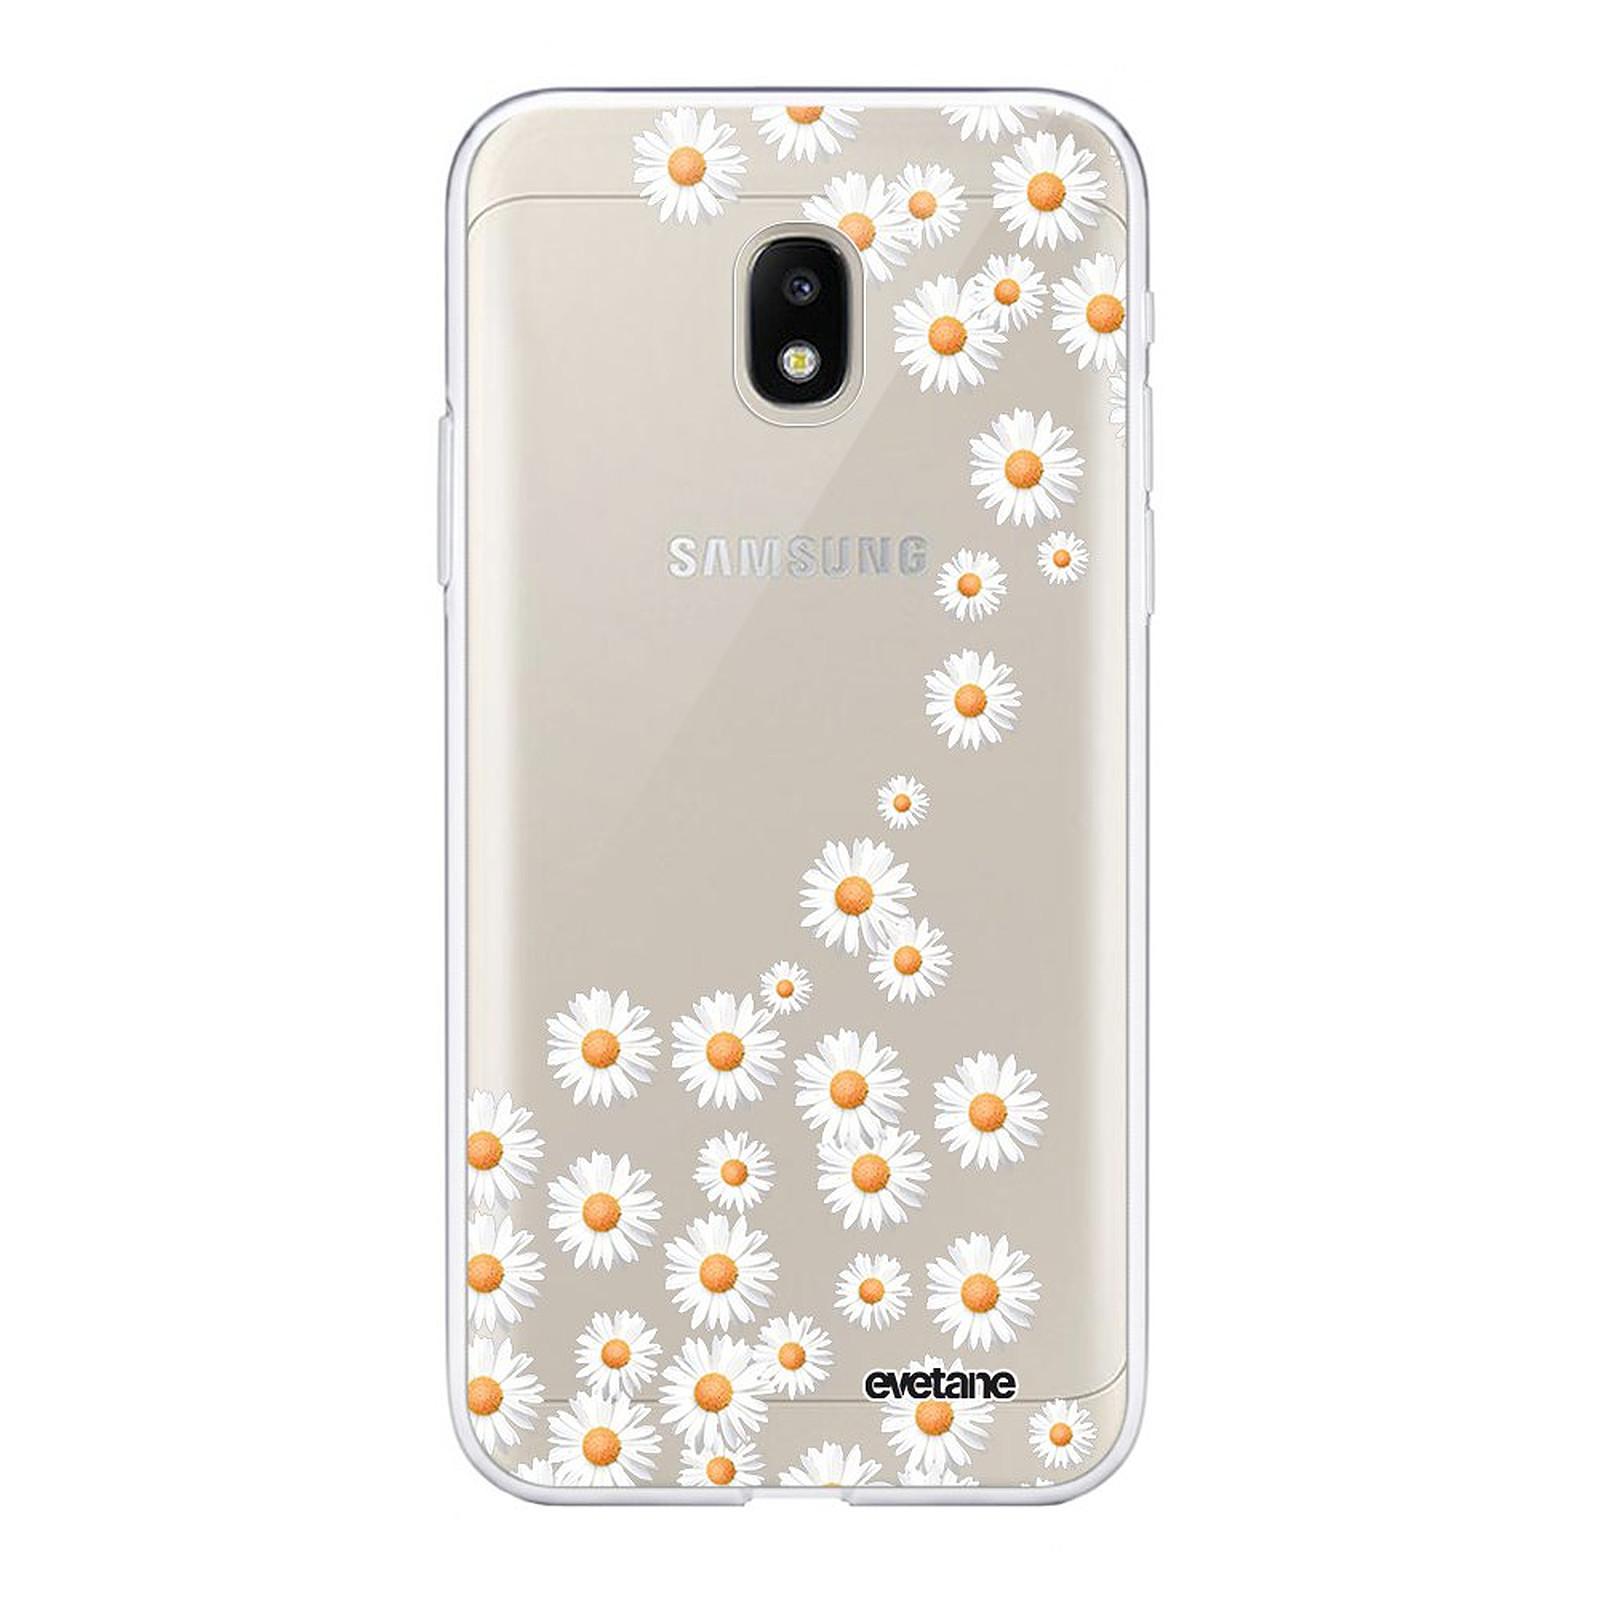 EVETANE Coque Samsung Galaxy J3 2017 souple transparente Marguerite - Coque téléphone Evetane sur LDLC